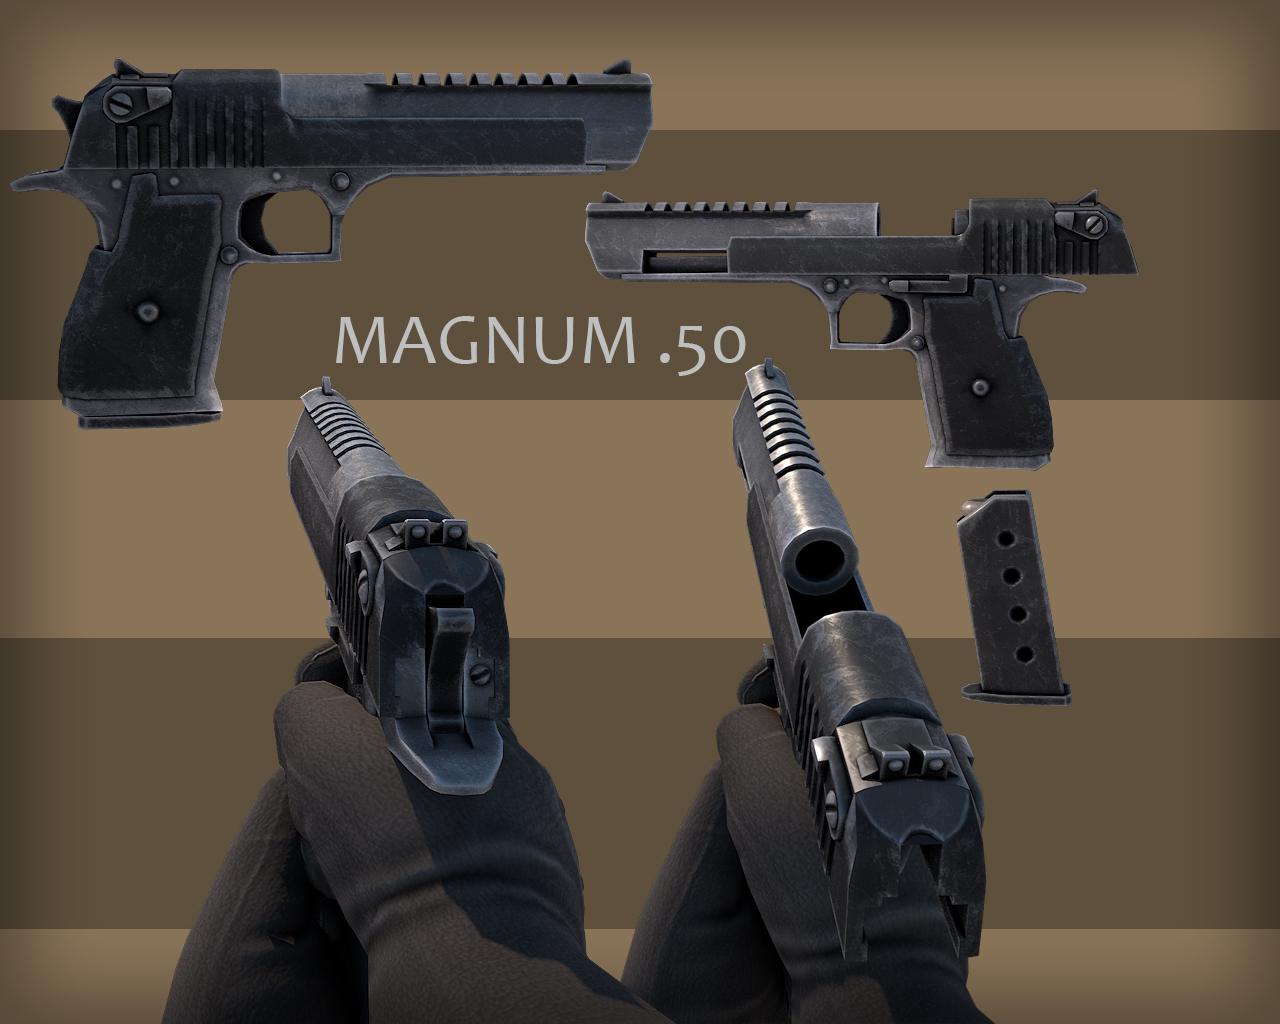 magnumpromo.jpg